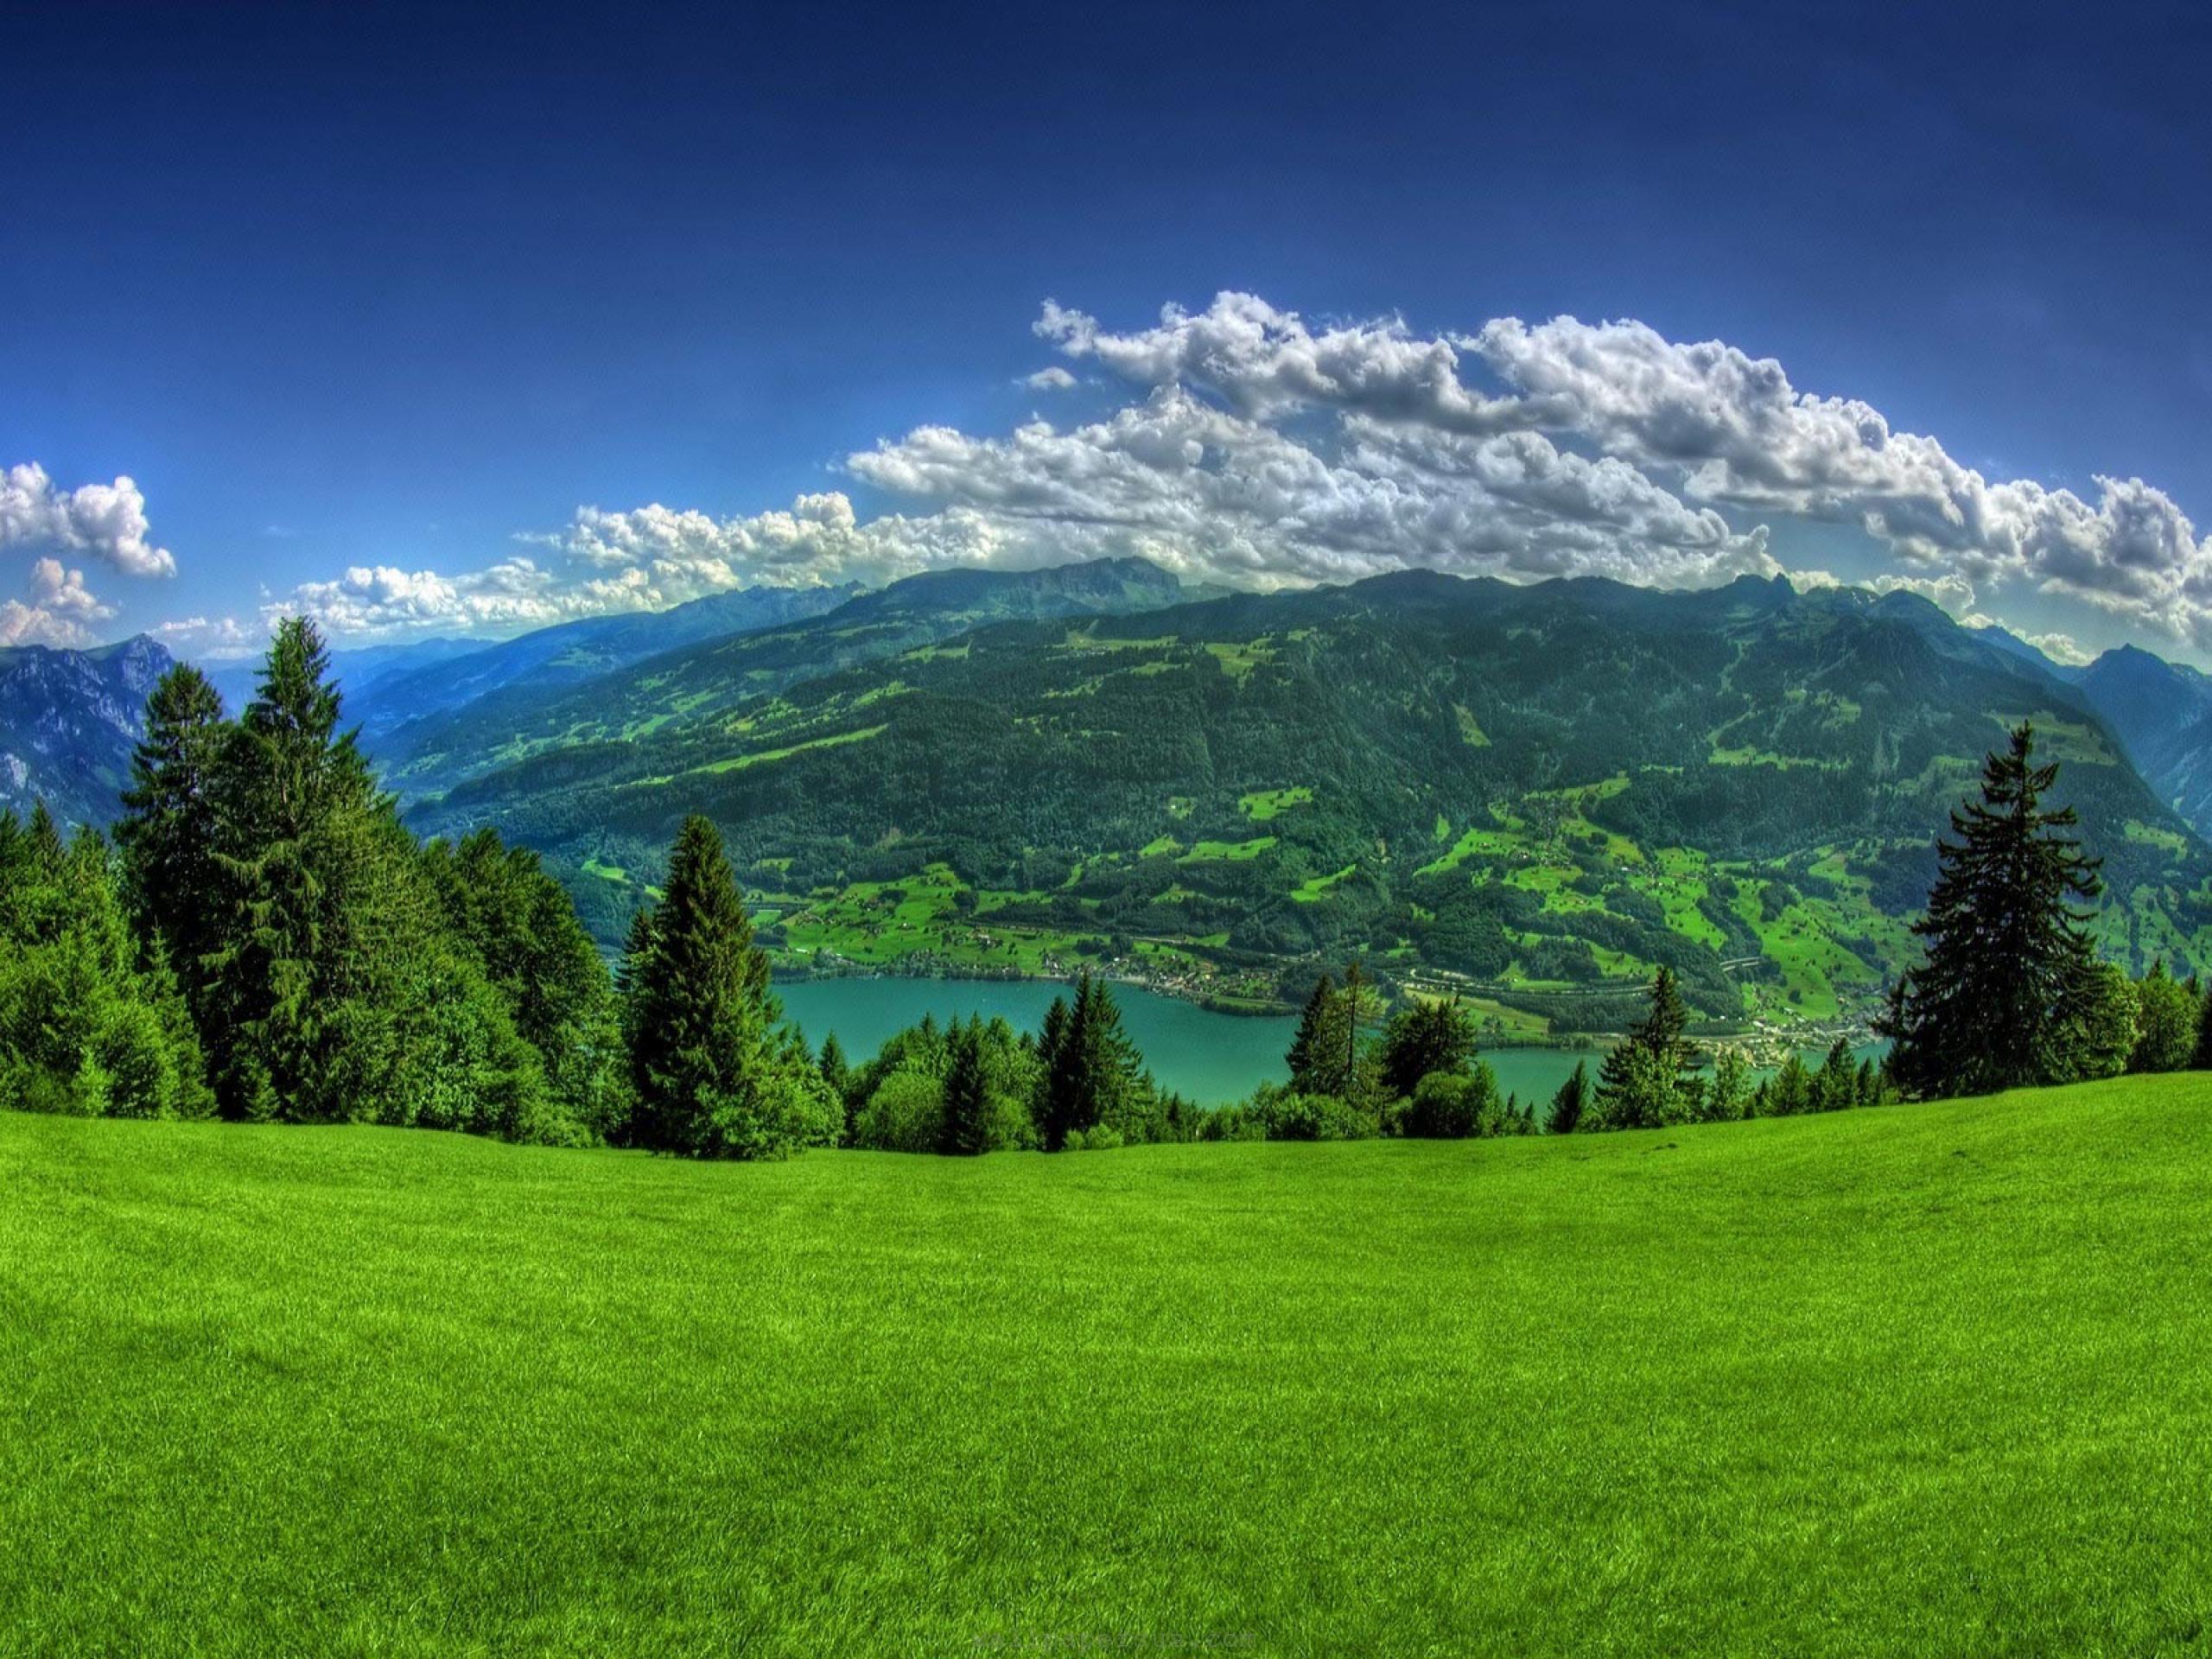 Lamborghini-Aventador-Mountain-Valley-Nature-nature-photography-wallpaper-wp5406631